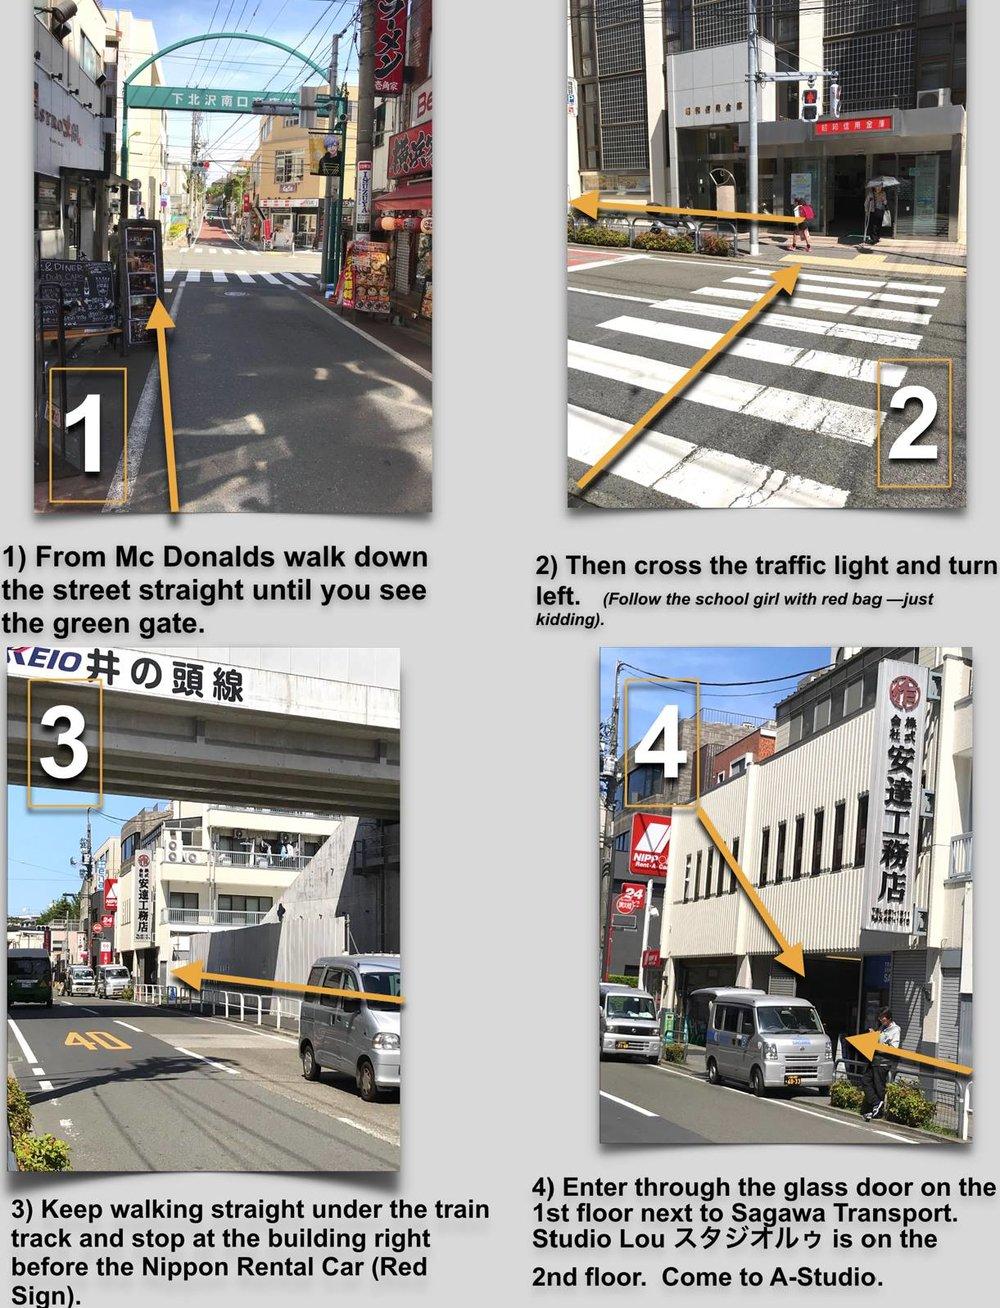 Studio Lou DIRECTIONS - 4 minutes from Shimokitazawa Southwest Exit2 minutes walk from McDonalds Shimokitazawa